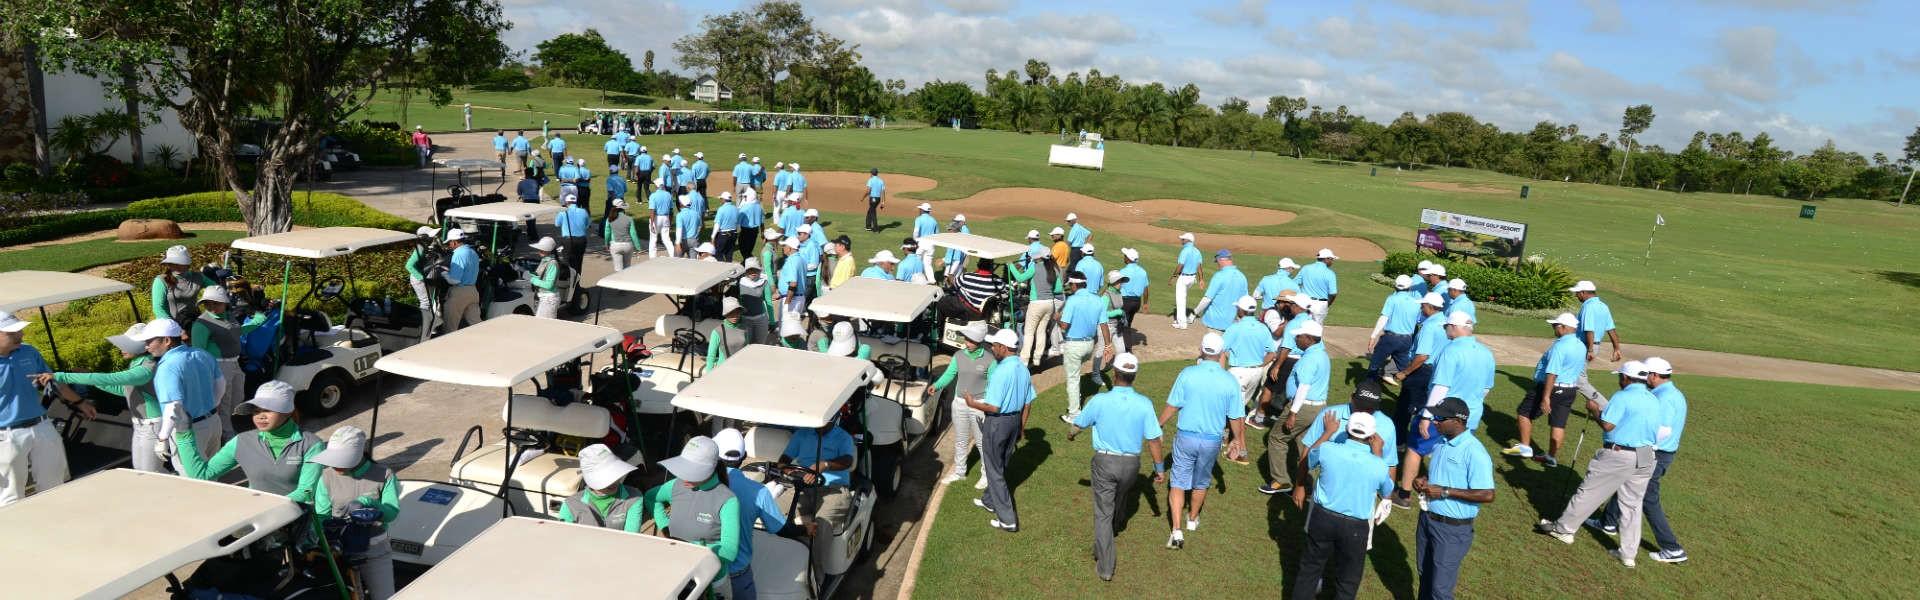 Ballantine's Team-Am Golf Challenge 8 in Siem Reap - Golfers Ready to Tee Off